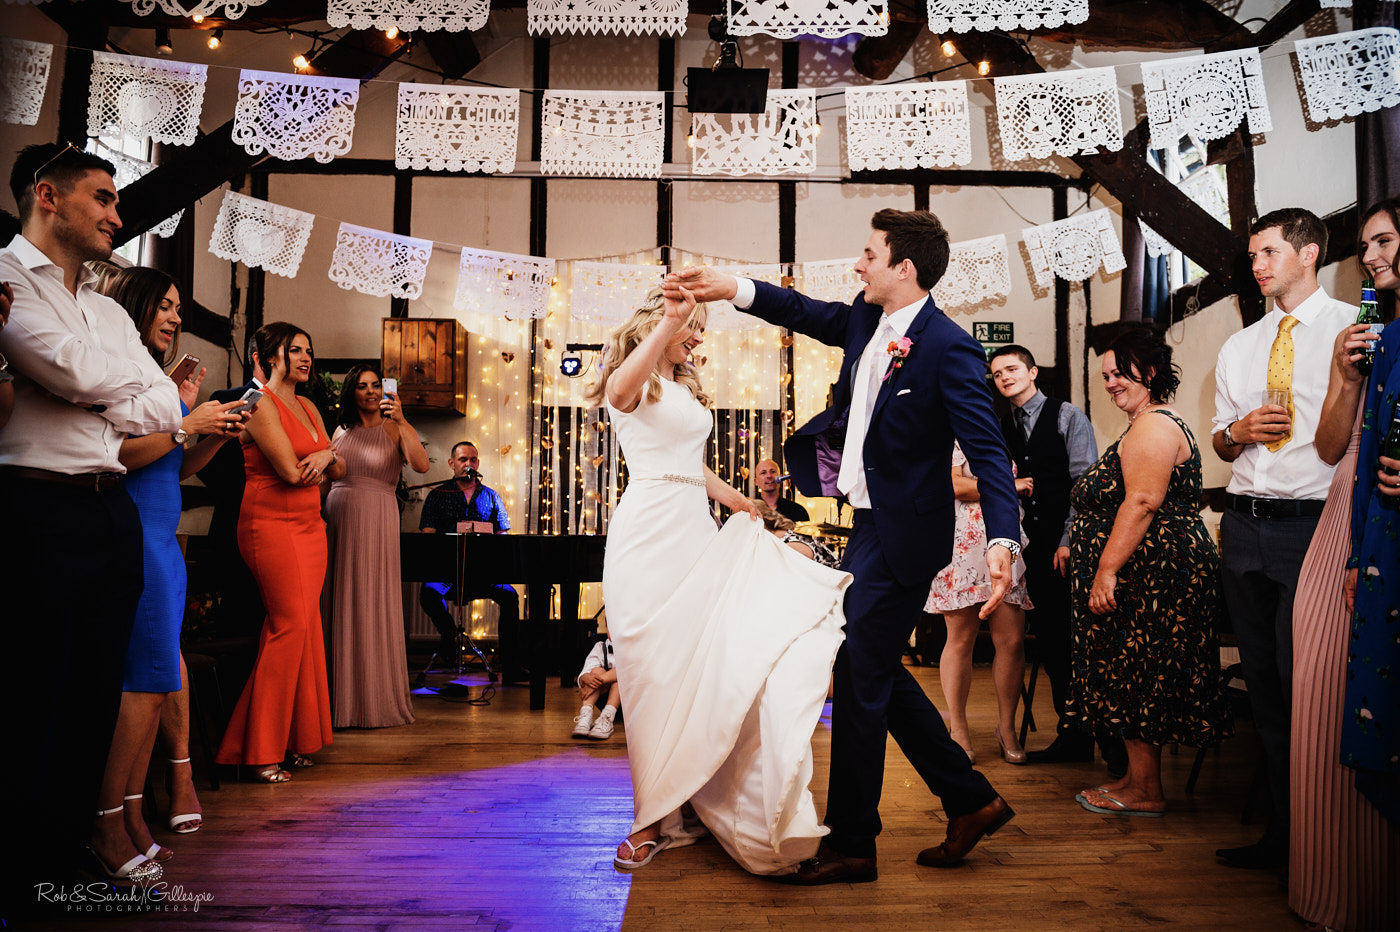 Belbroughton village hall wedding dancing